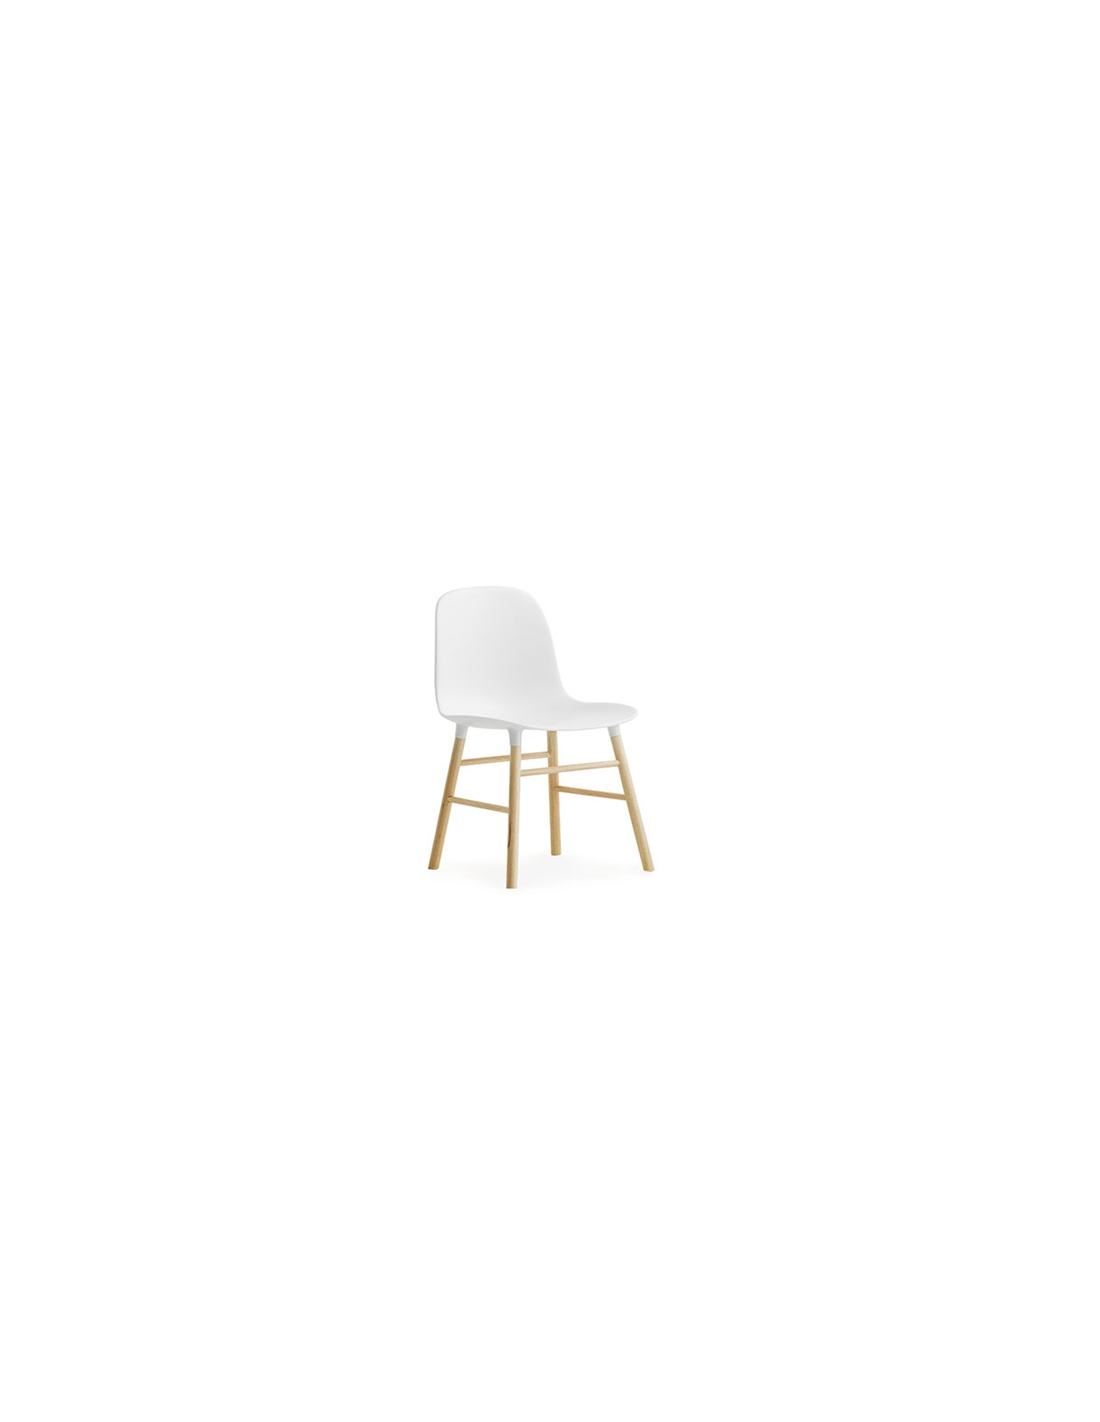 Miniatur stuhl form von normann copenhagen for Design stuhl form